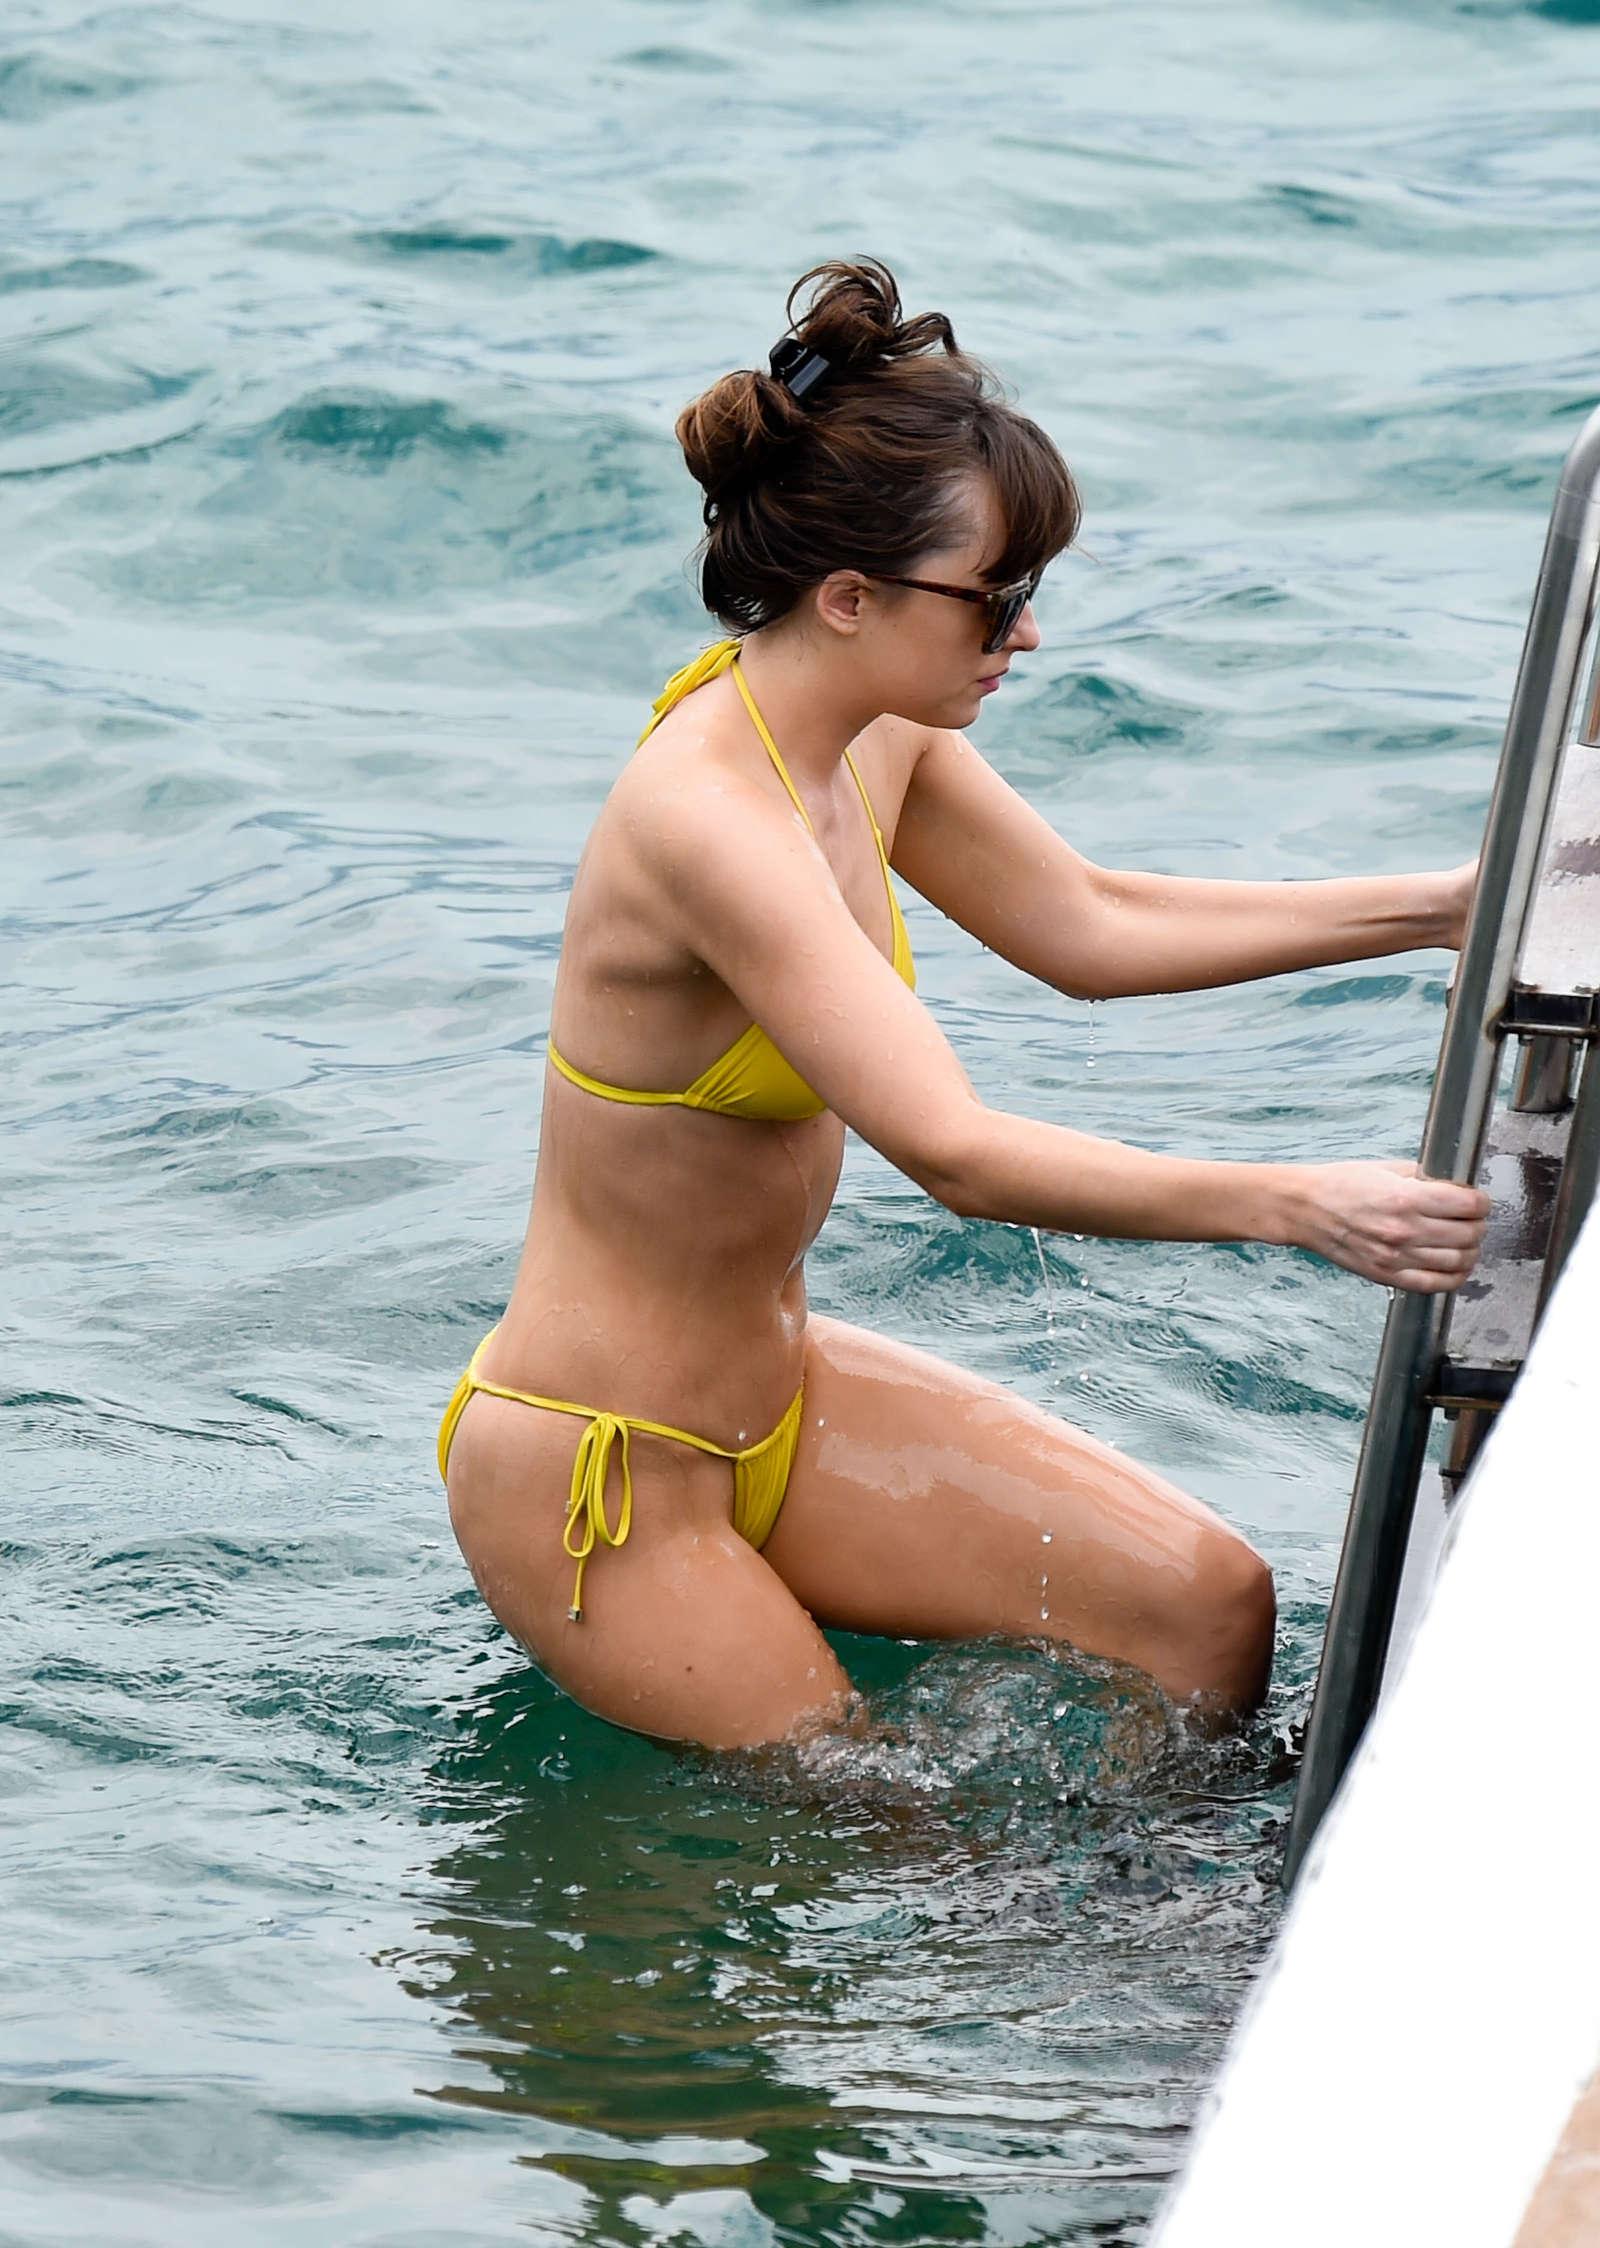 Dakota Johnson 2016 : Dakota Johnson in Yellow Bikini 2016 -27